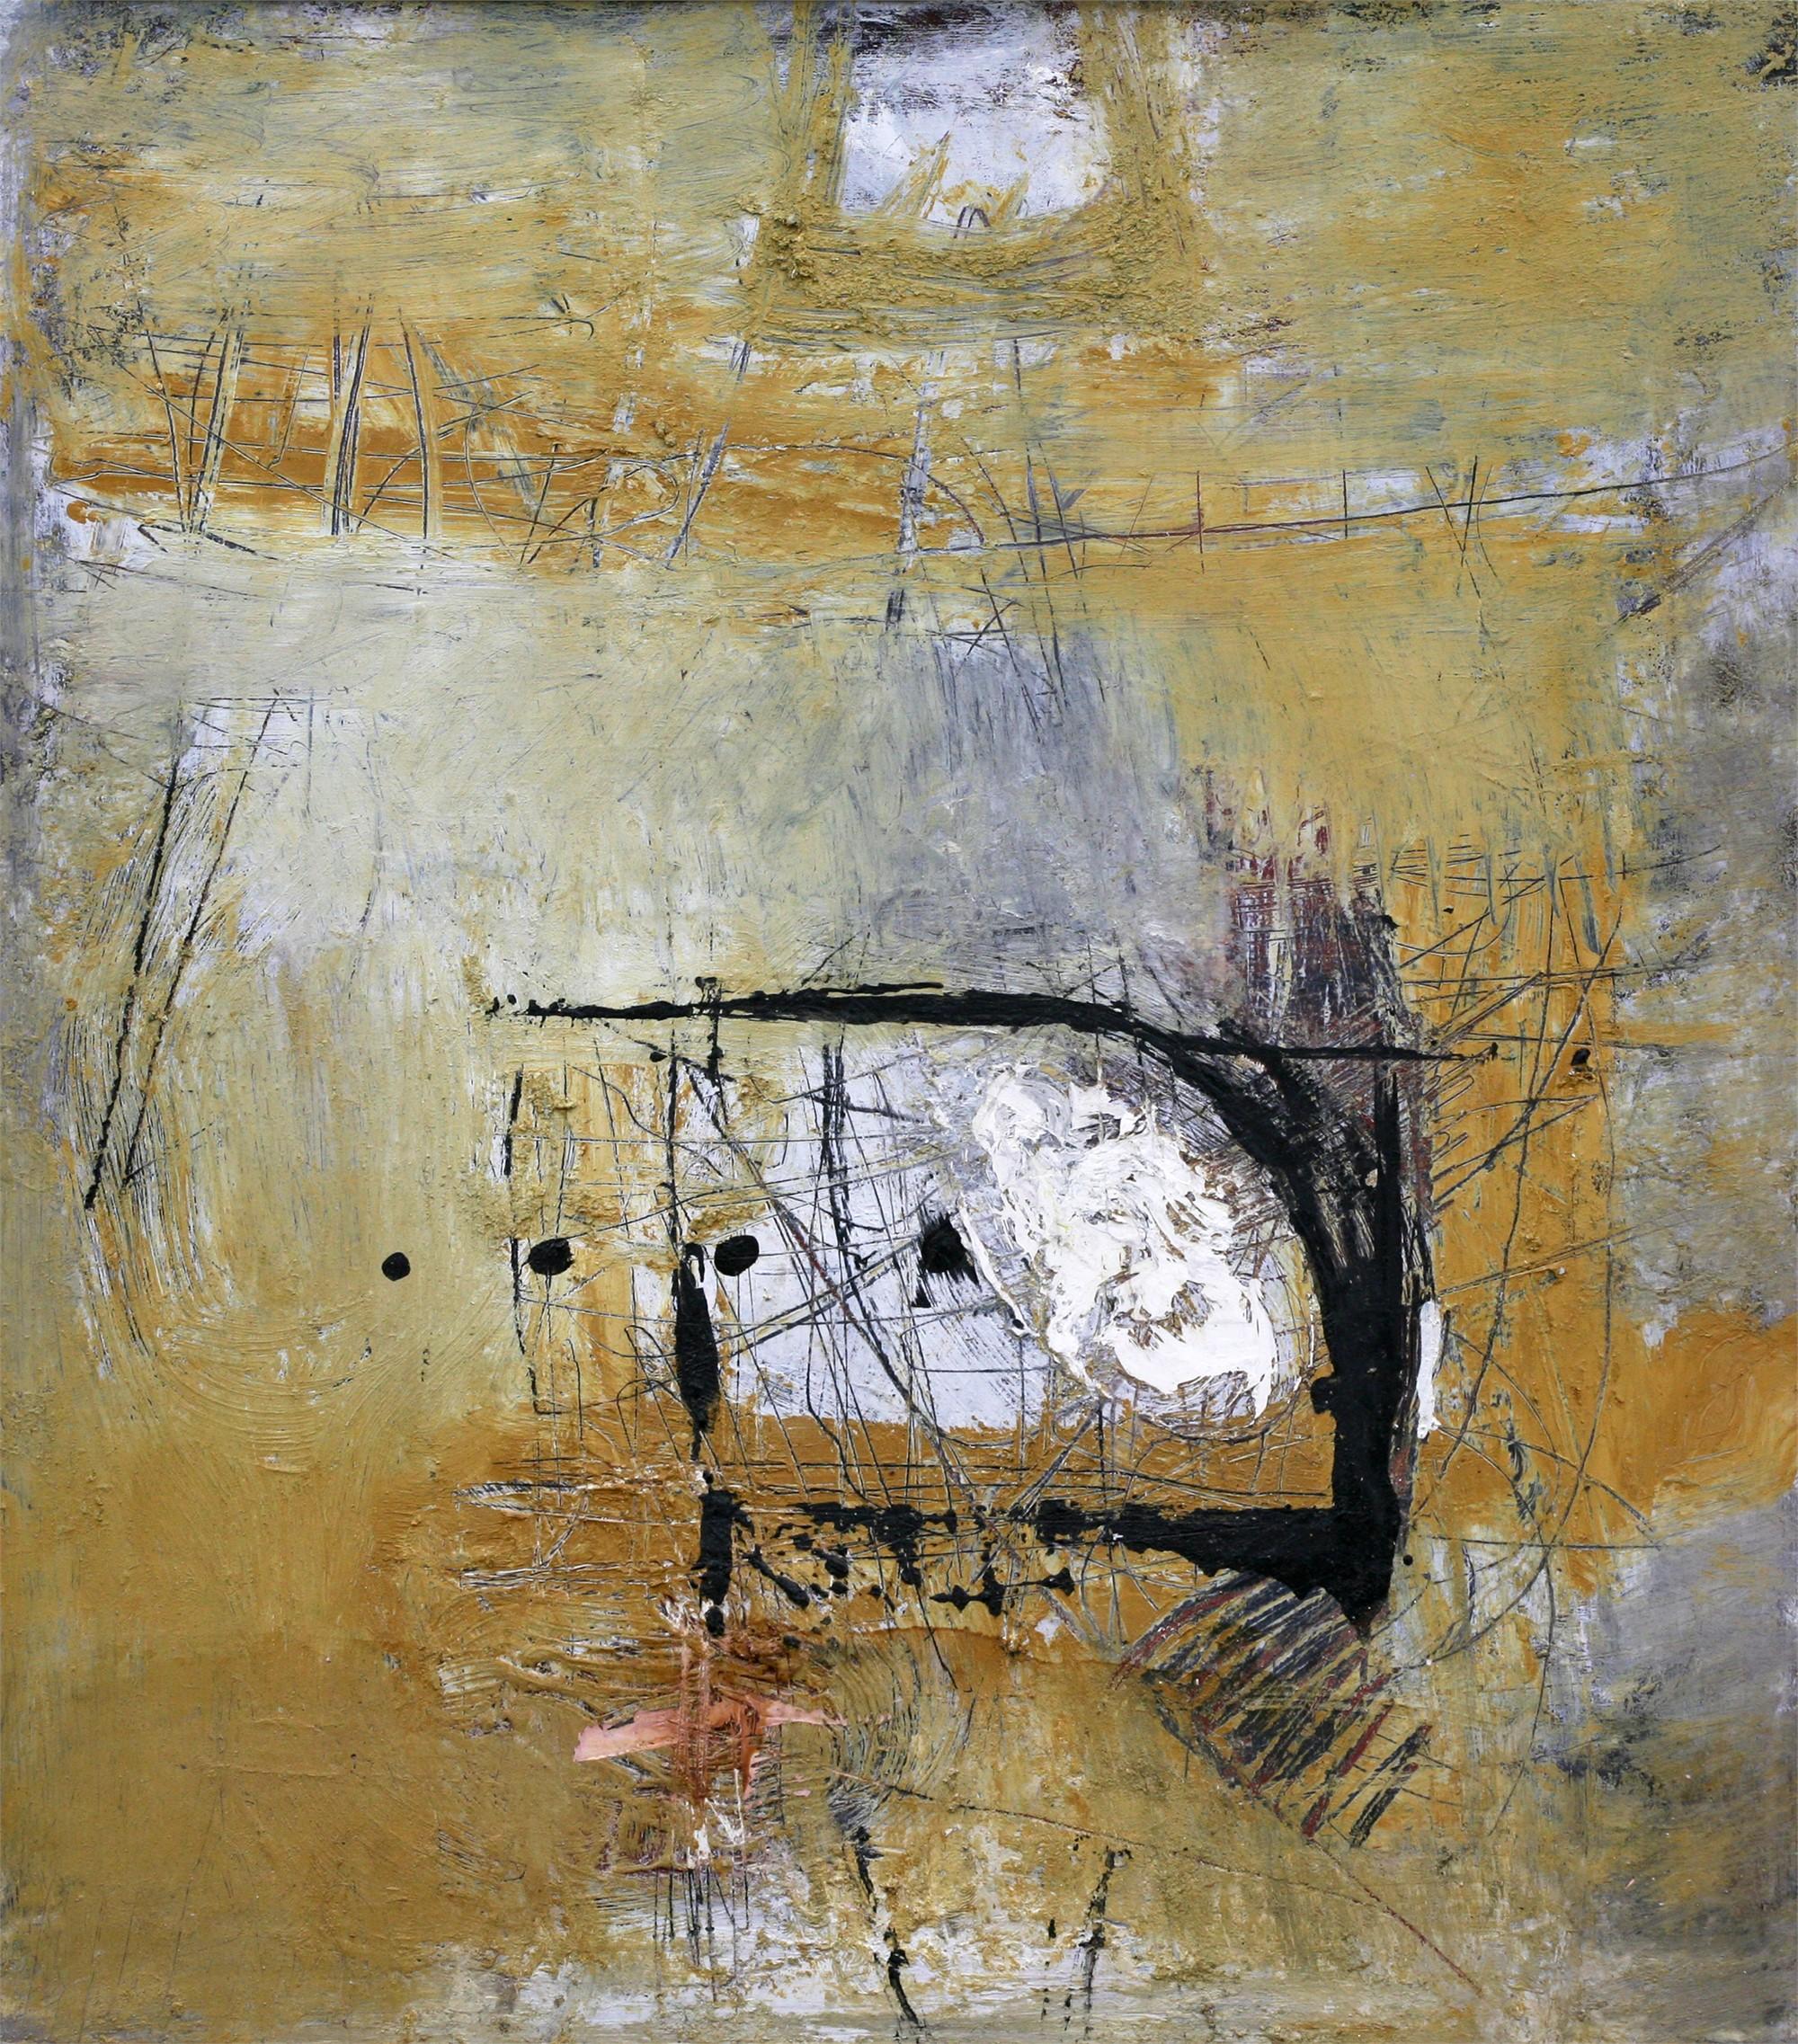 Endure by John McCaw